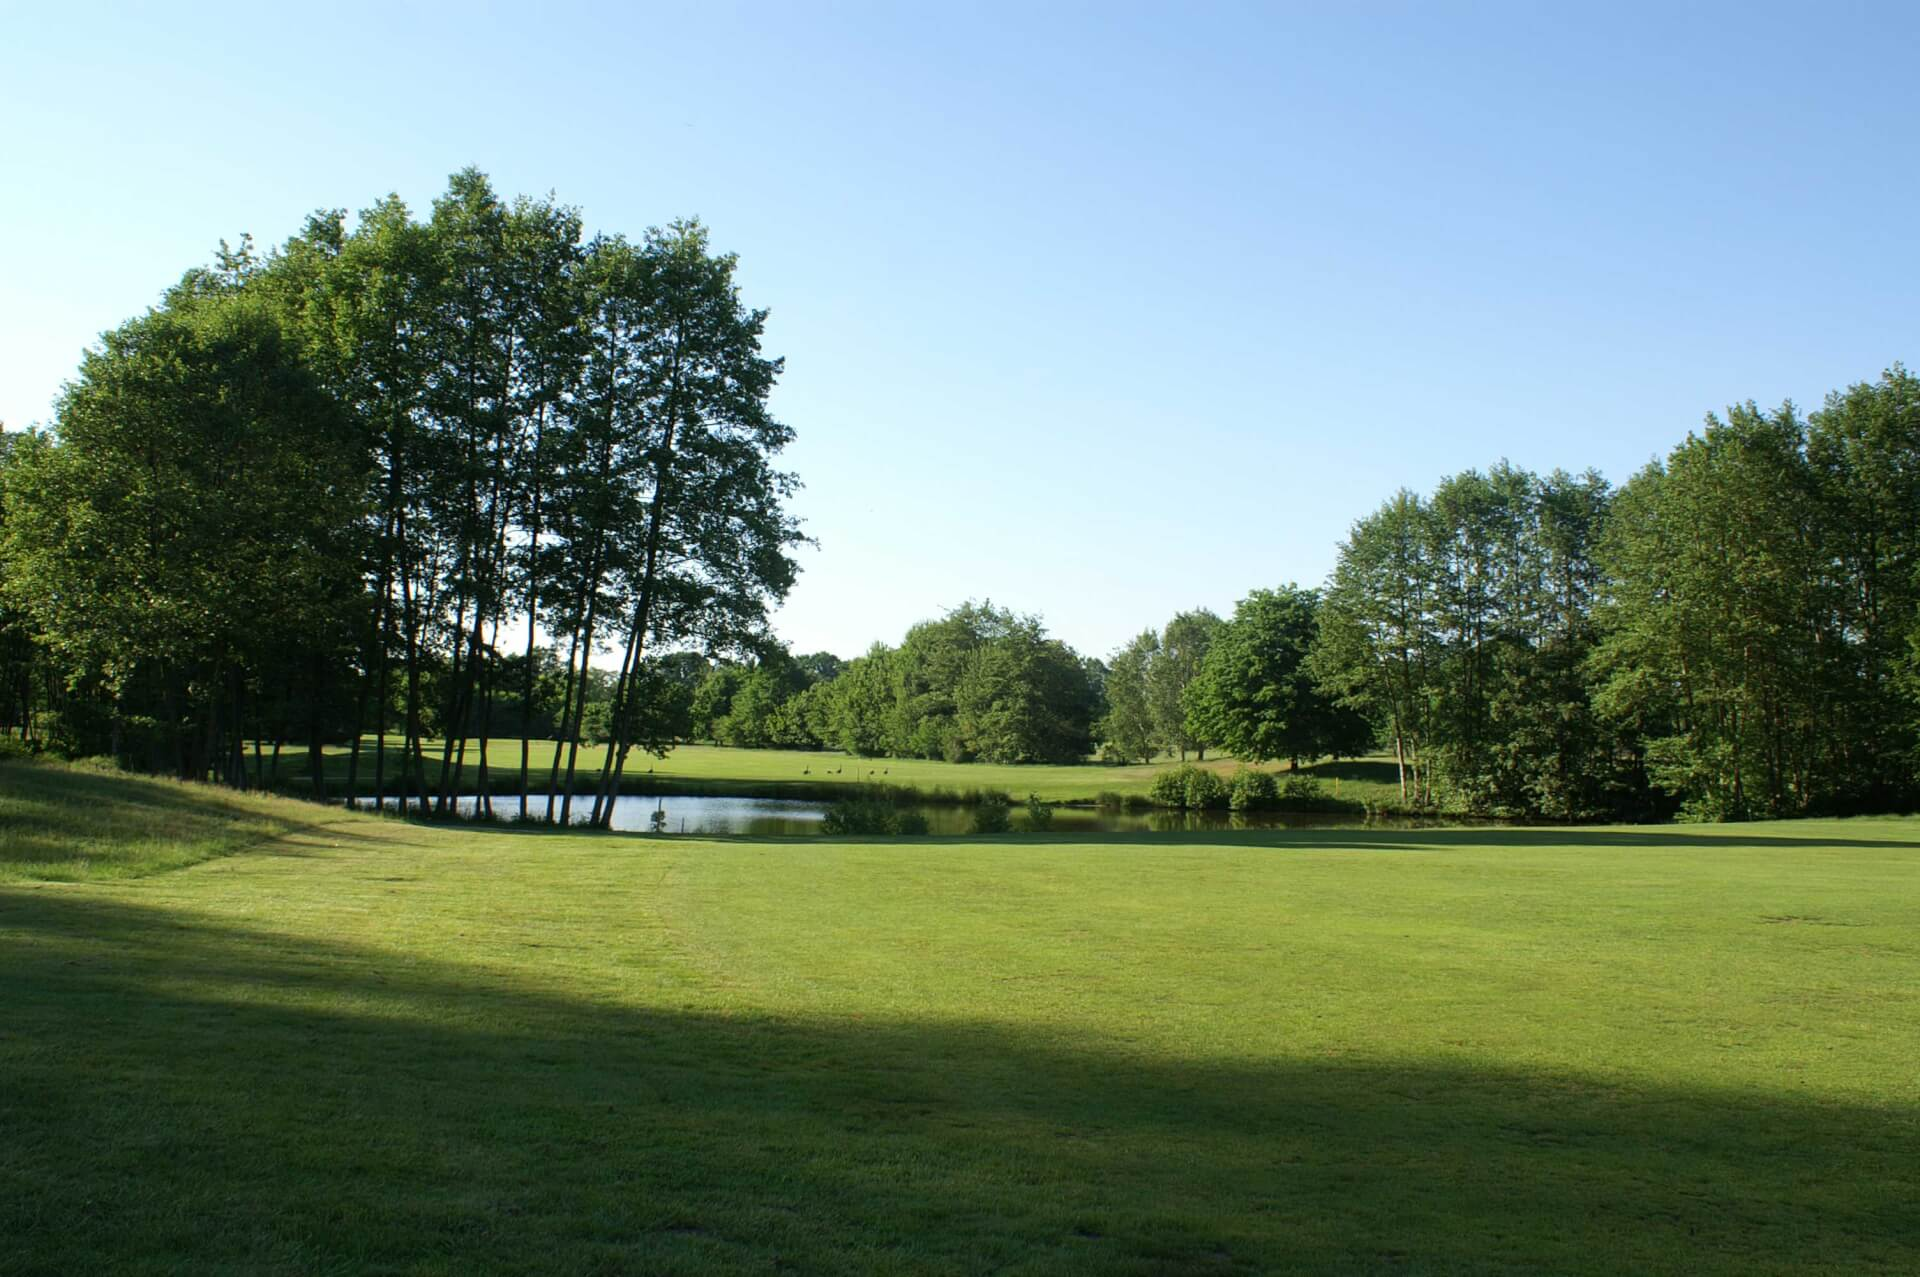 https://golfclub-peckeloh.de/wp-content/uploads/2018/02/PICT0455-3.jpg